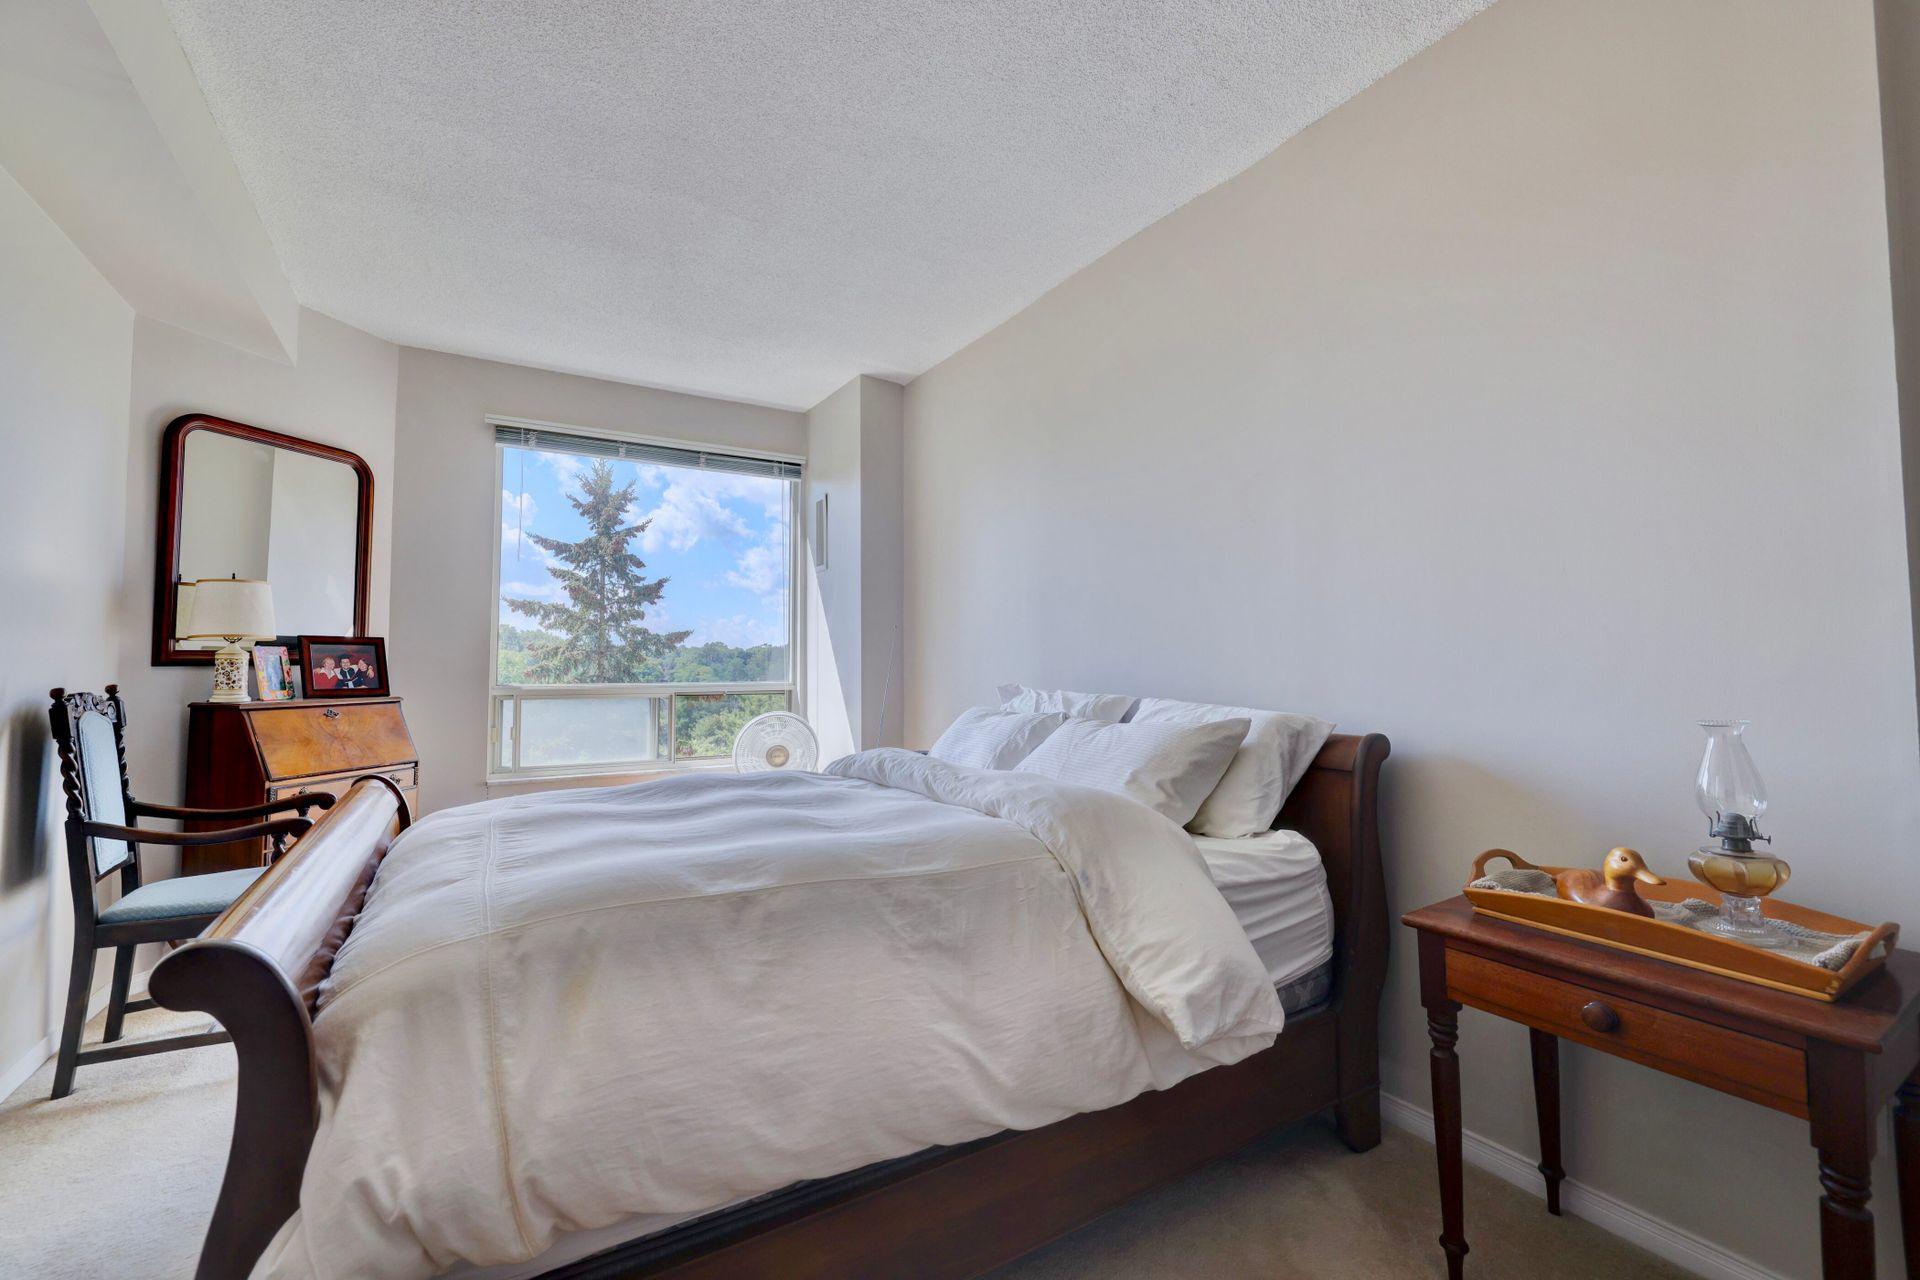 Bedroom at 403 - 2511 Lakeshore Road West, Bronte West, Oakville